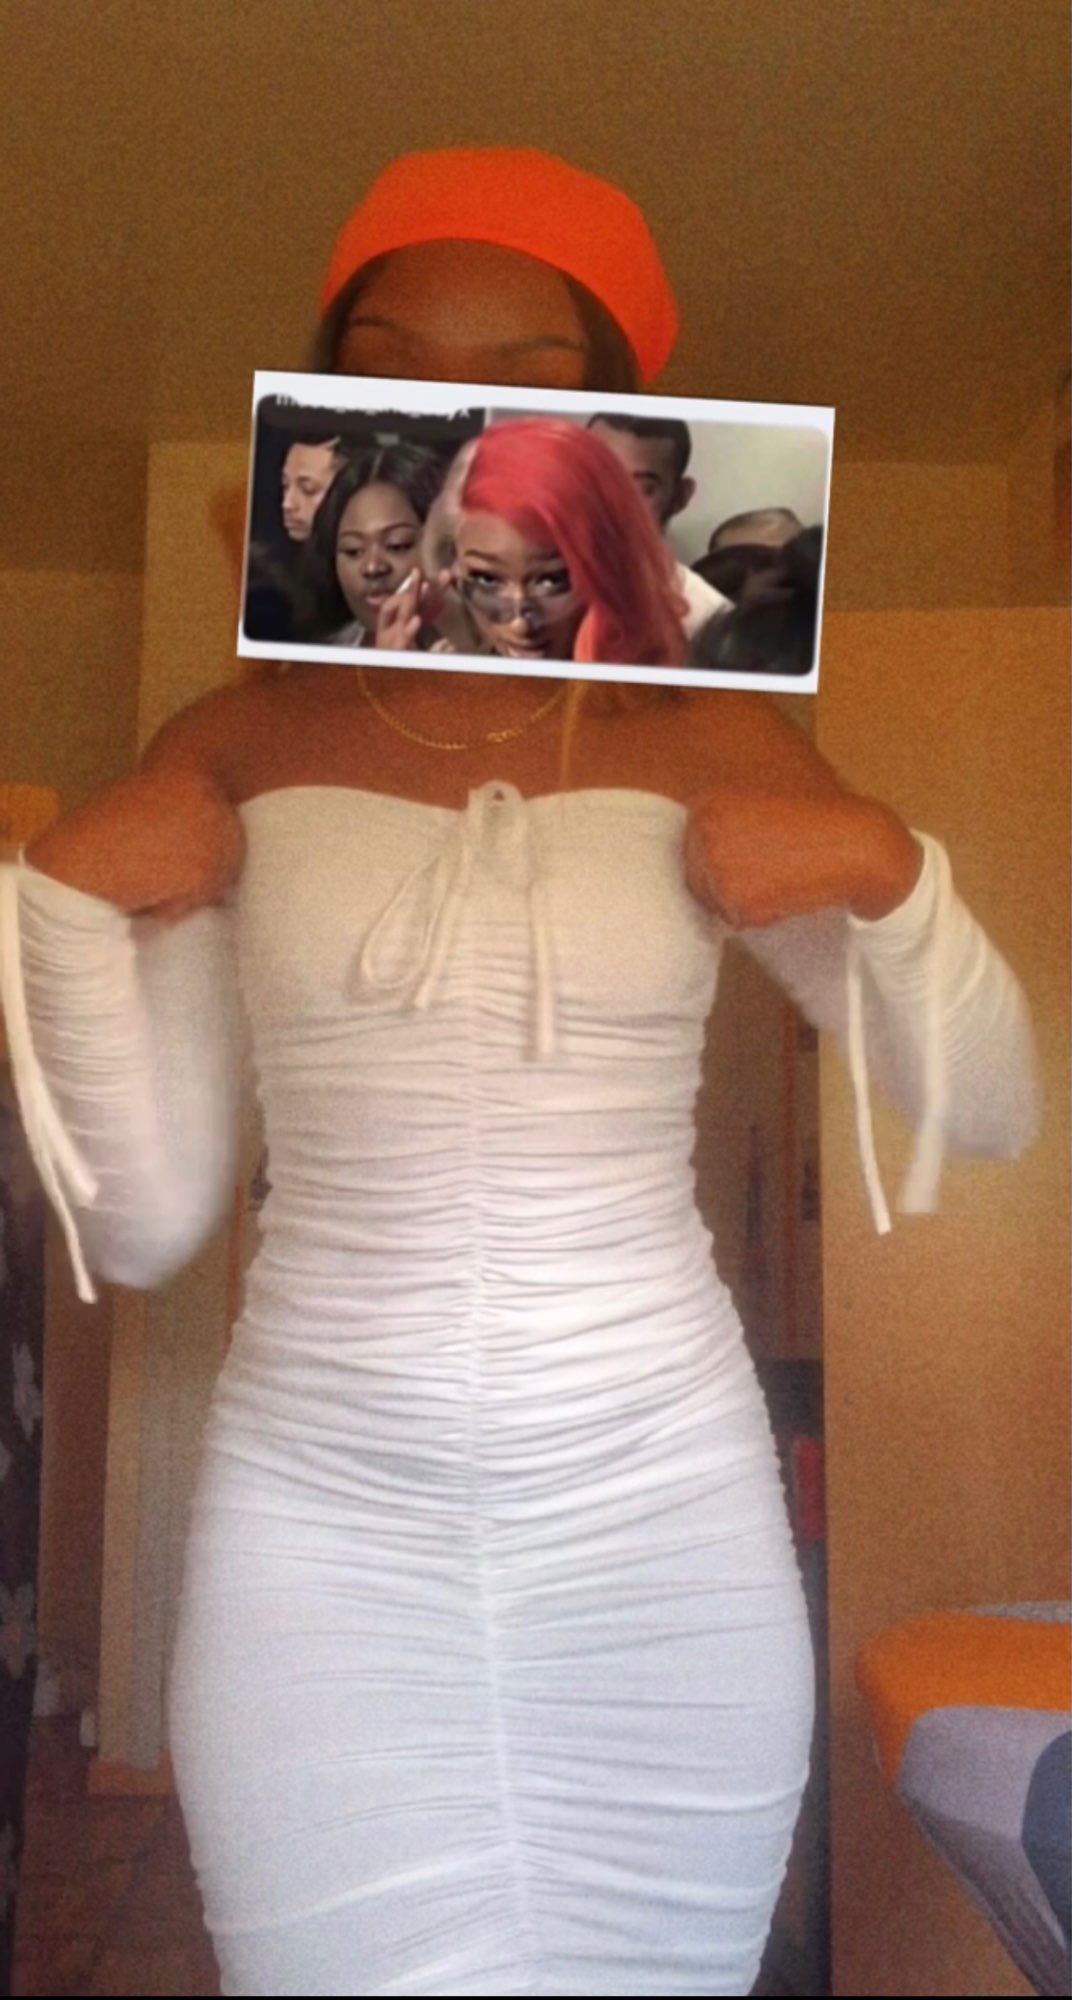 Articat Women Autumn Winter Bandage Dress Women 2020 Sexy Off Shoulder Long Sleeve Slim Elastic Bodycon Party Dresses Vestidos|vestido off|dress vestidosbandage dress - AliExpress